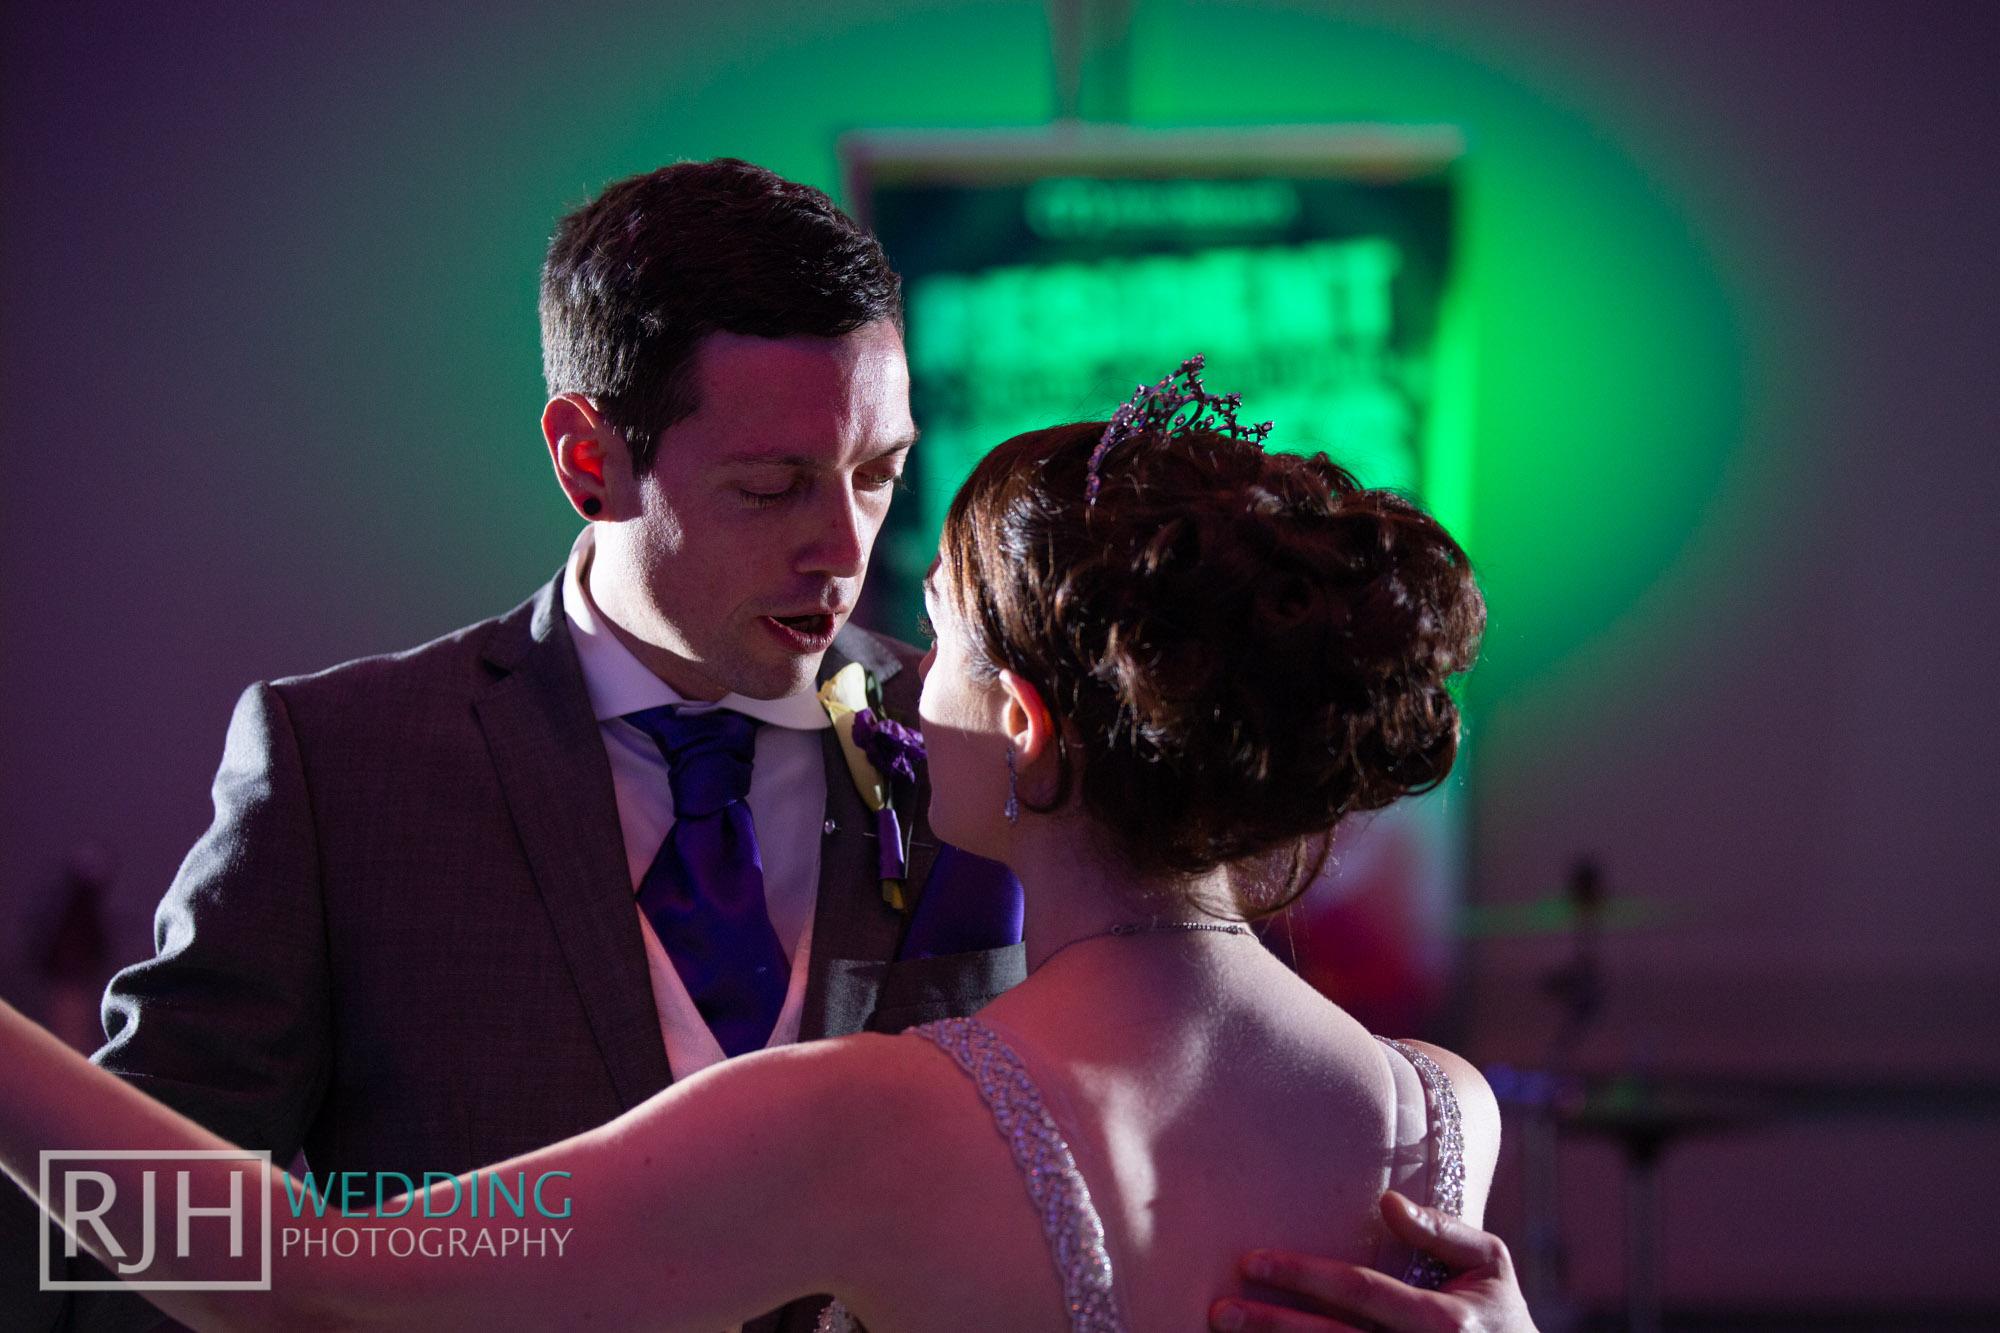 Oulton Hall Wedding Photography_Goodwill-Hall_055_RJH18354.jpg